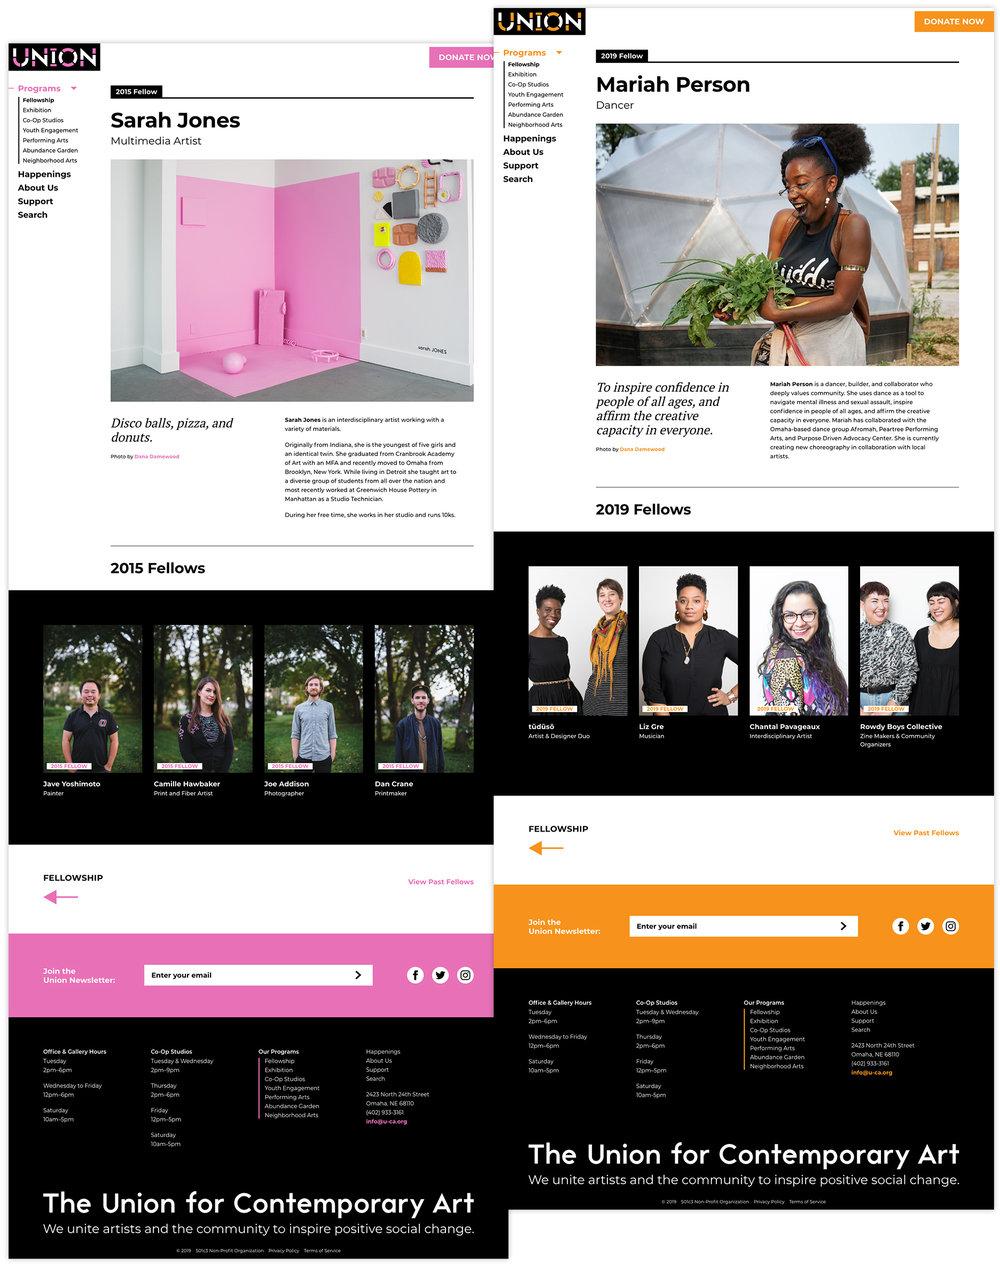 jkdc_union-web-pagedesigns-fellowship.jpg